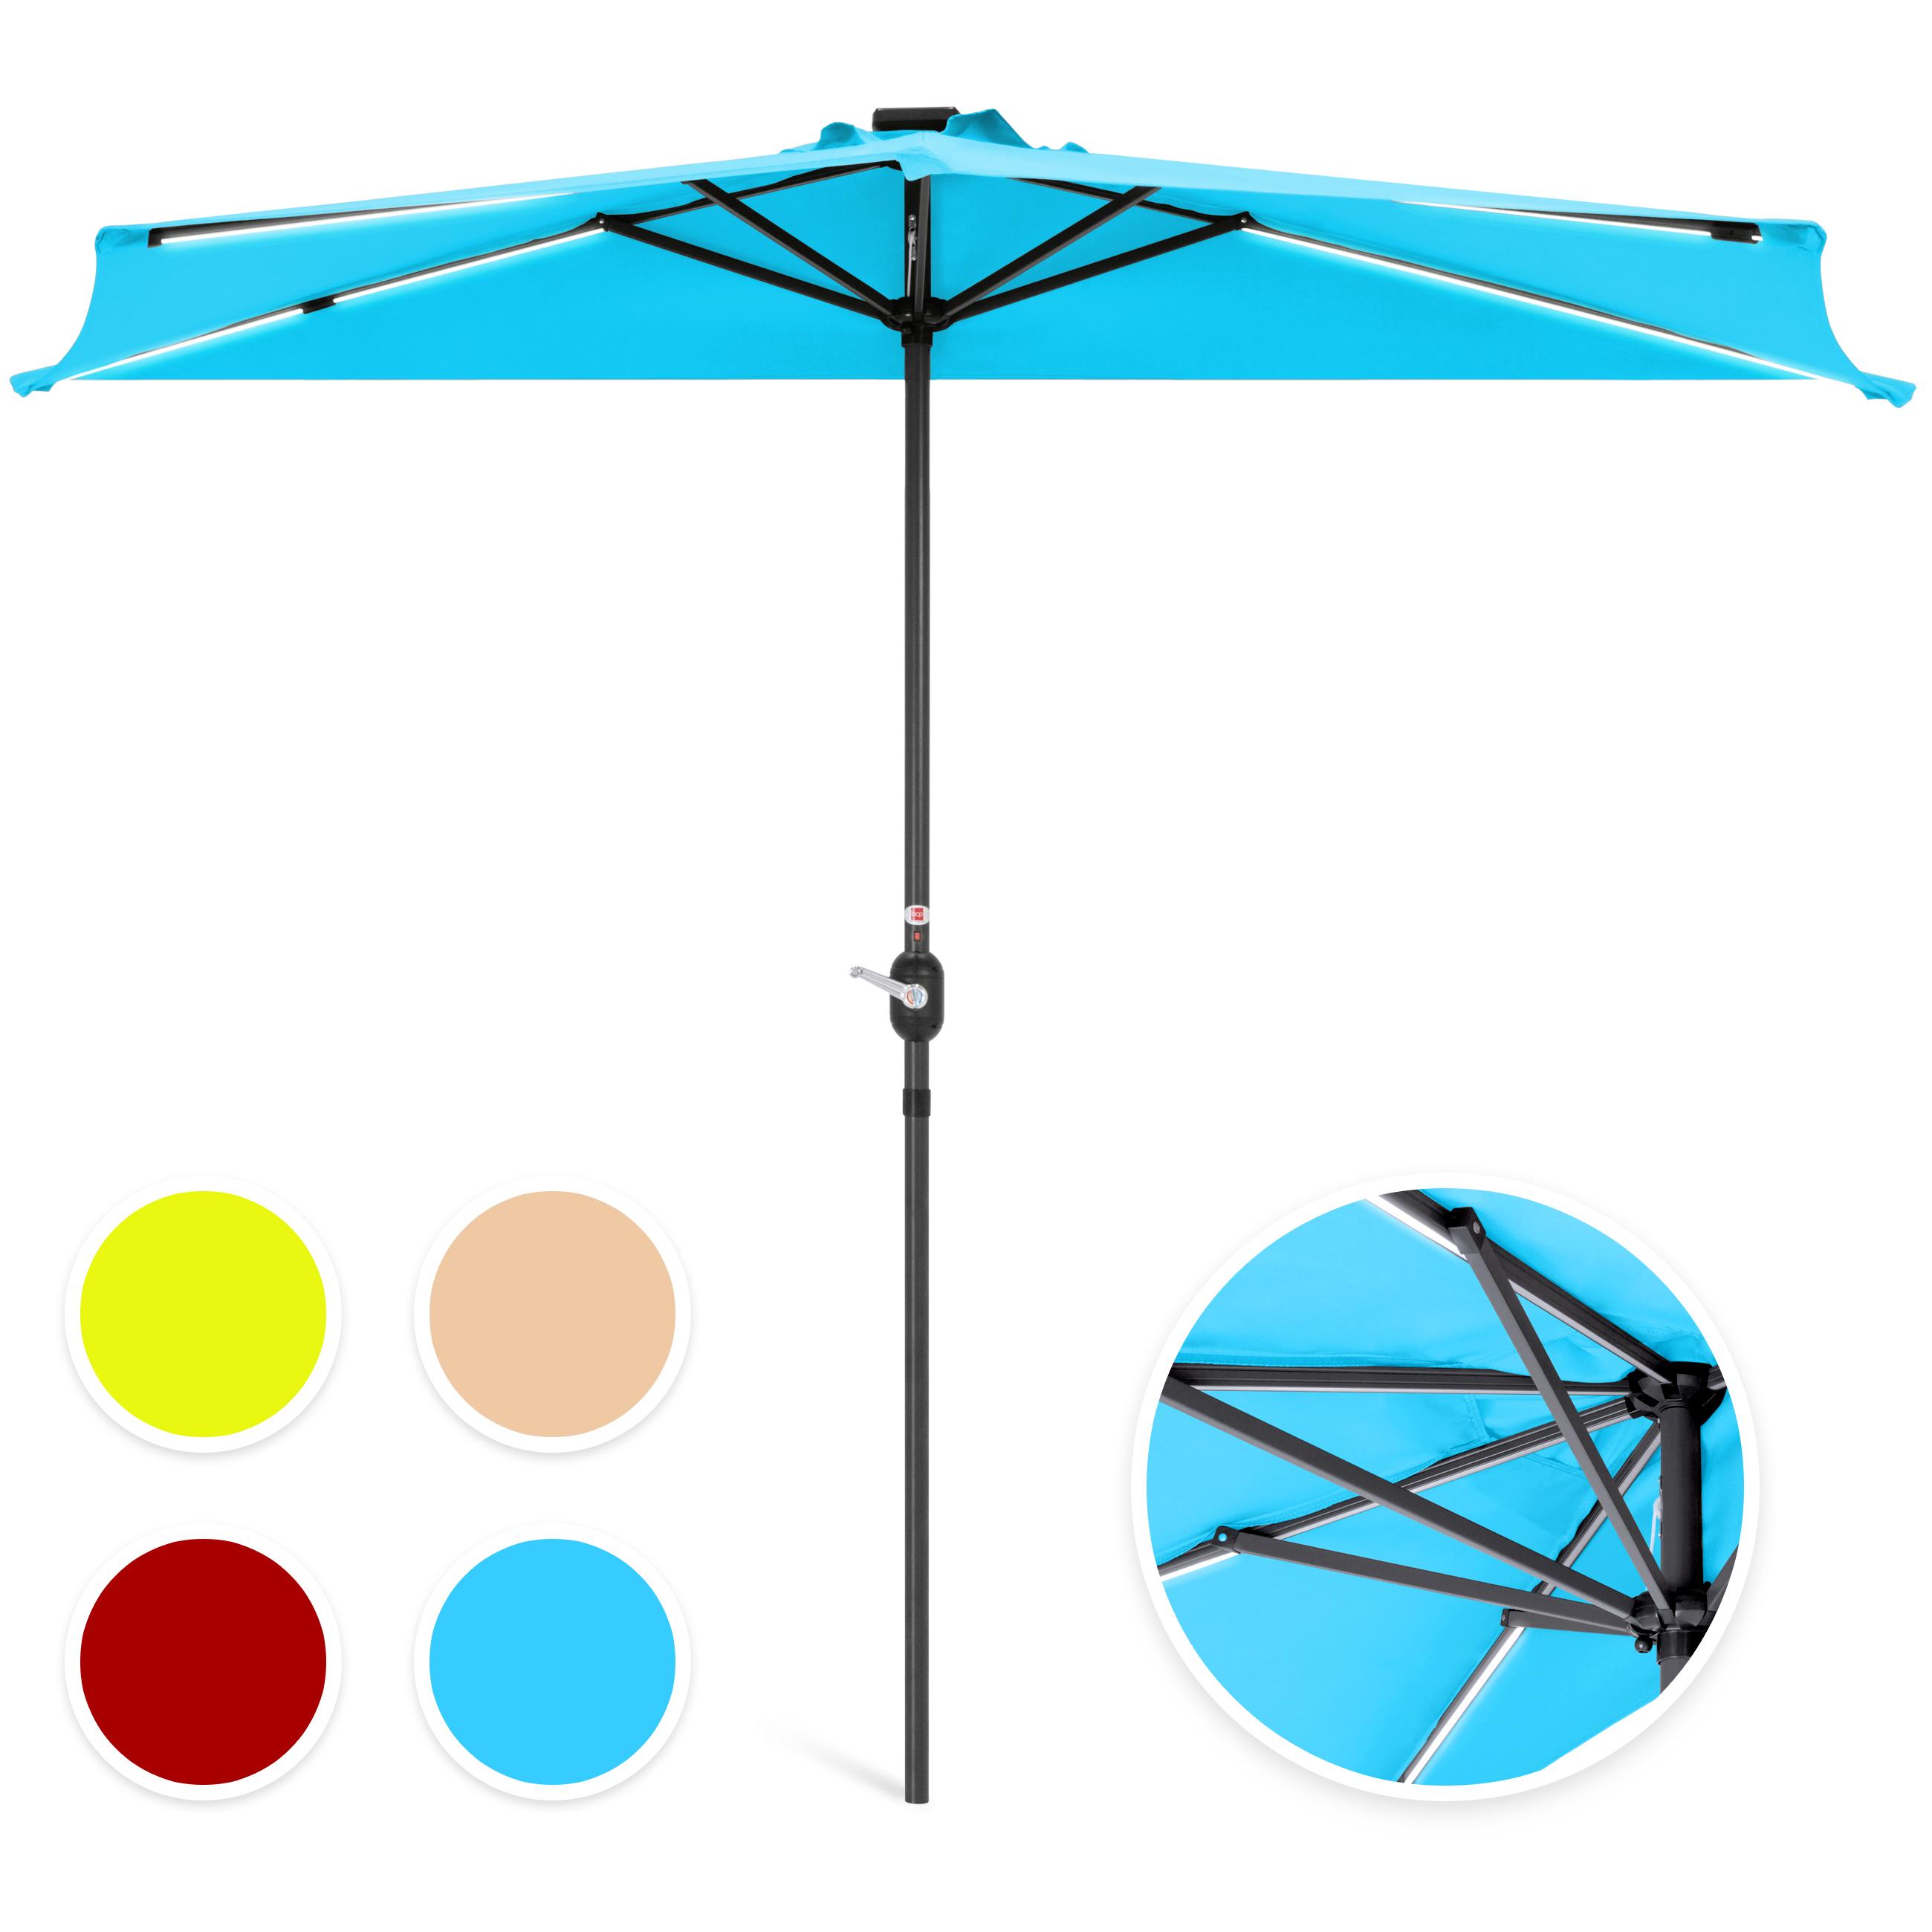 Best Choice Products 8.5ft Solar LED Strip Lighted Half Patio Umbrella - Tan